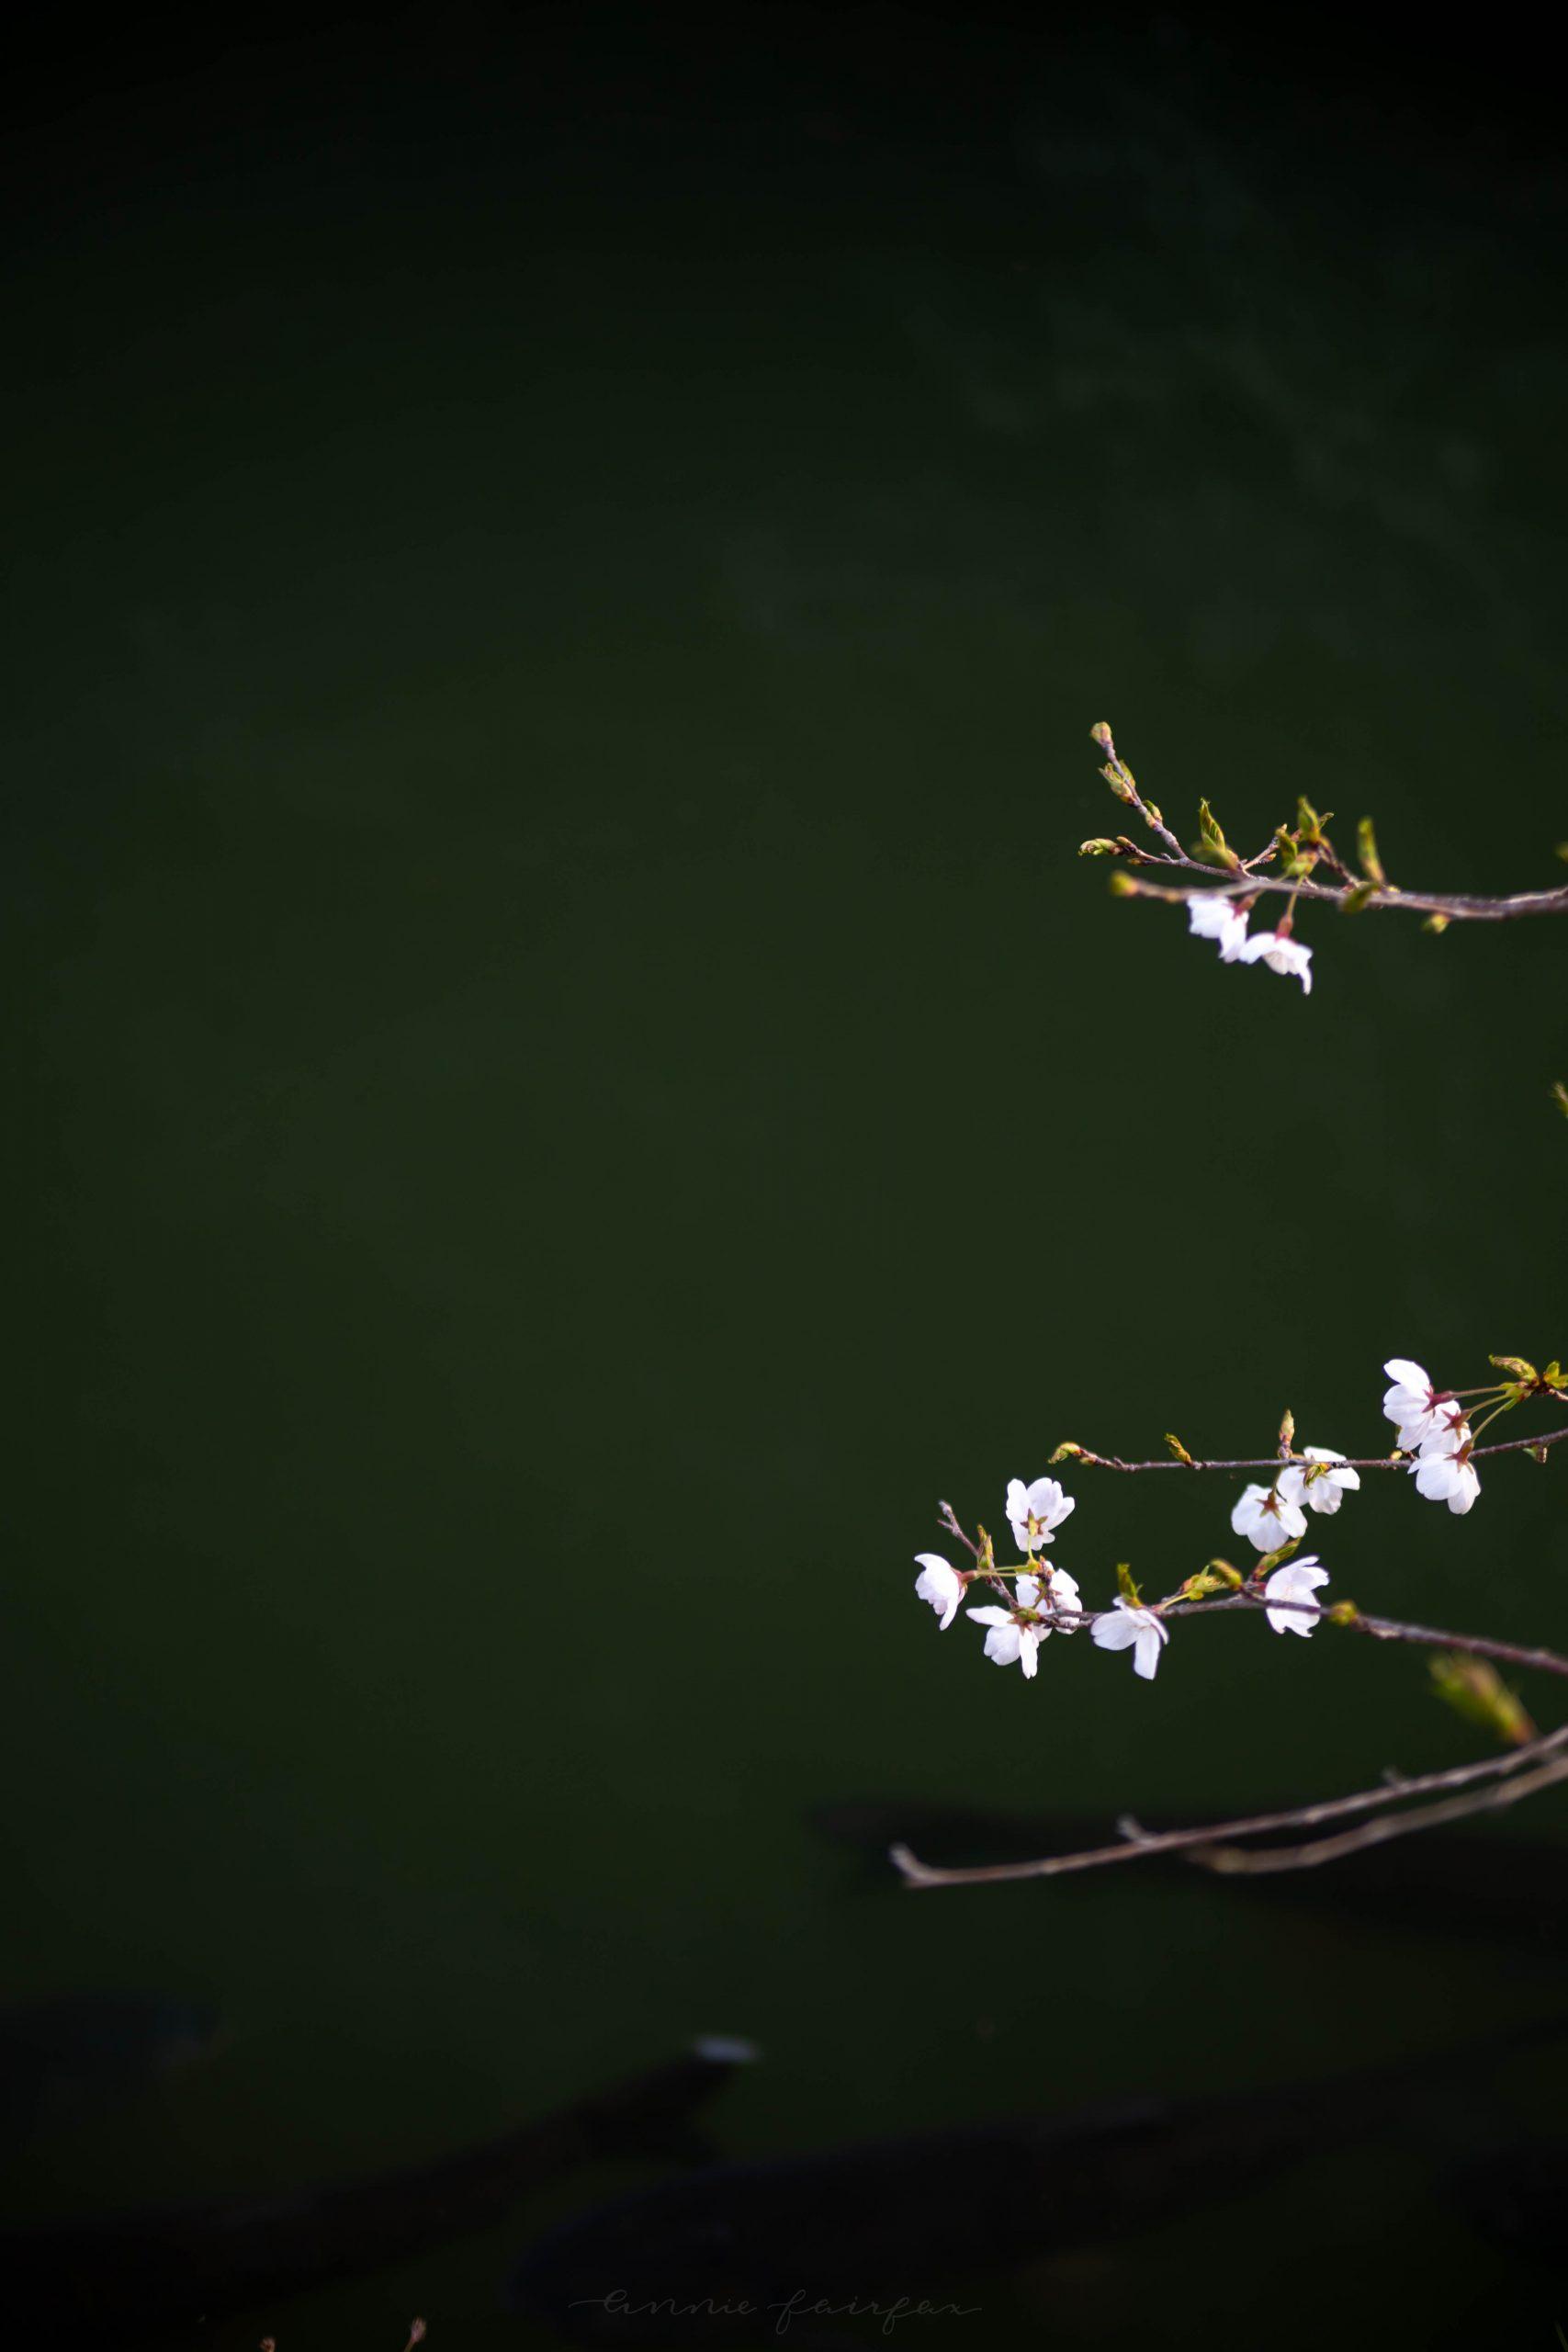 Park at Sunset Near Himeji Castle Cherry Blossom Season in Hemeji Japan by @AnnieFairfax